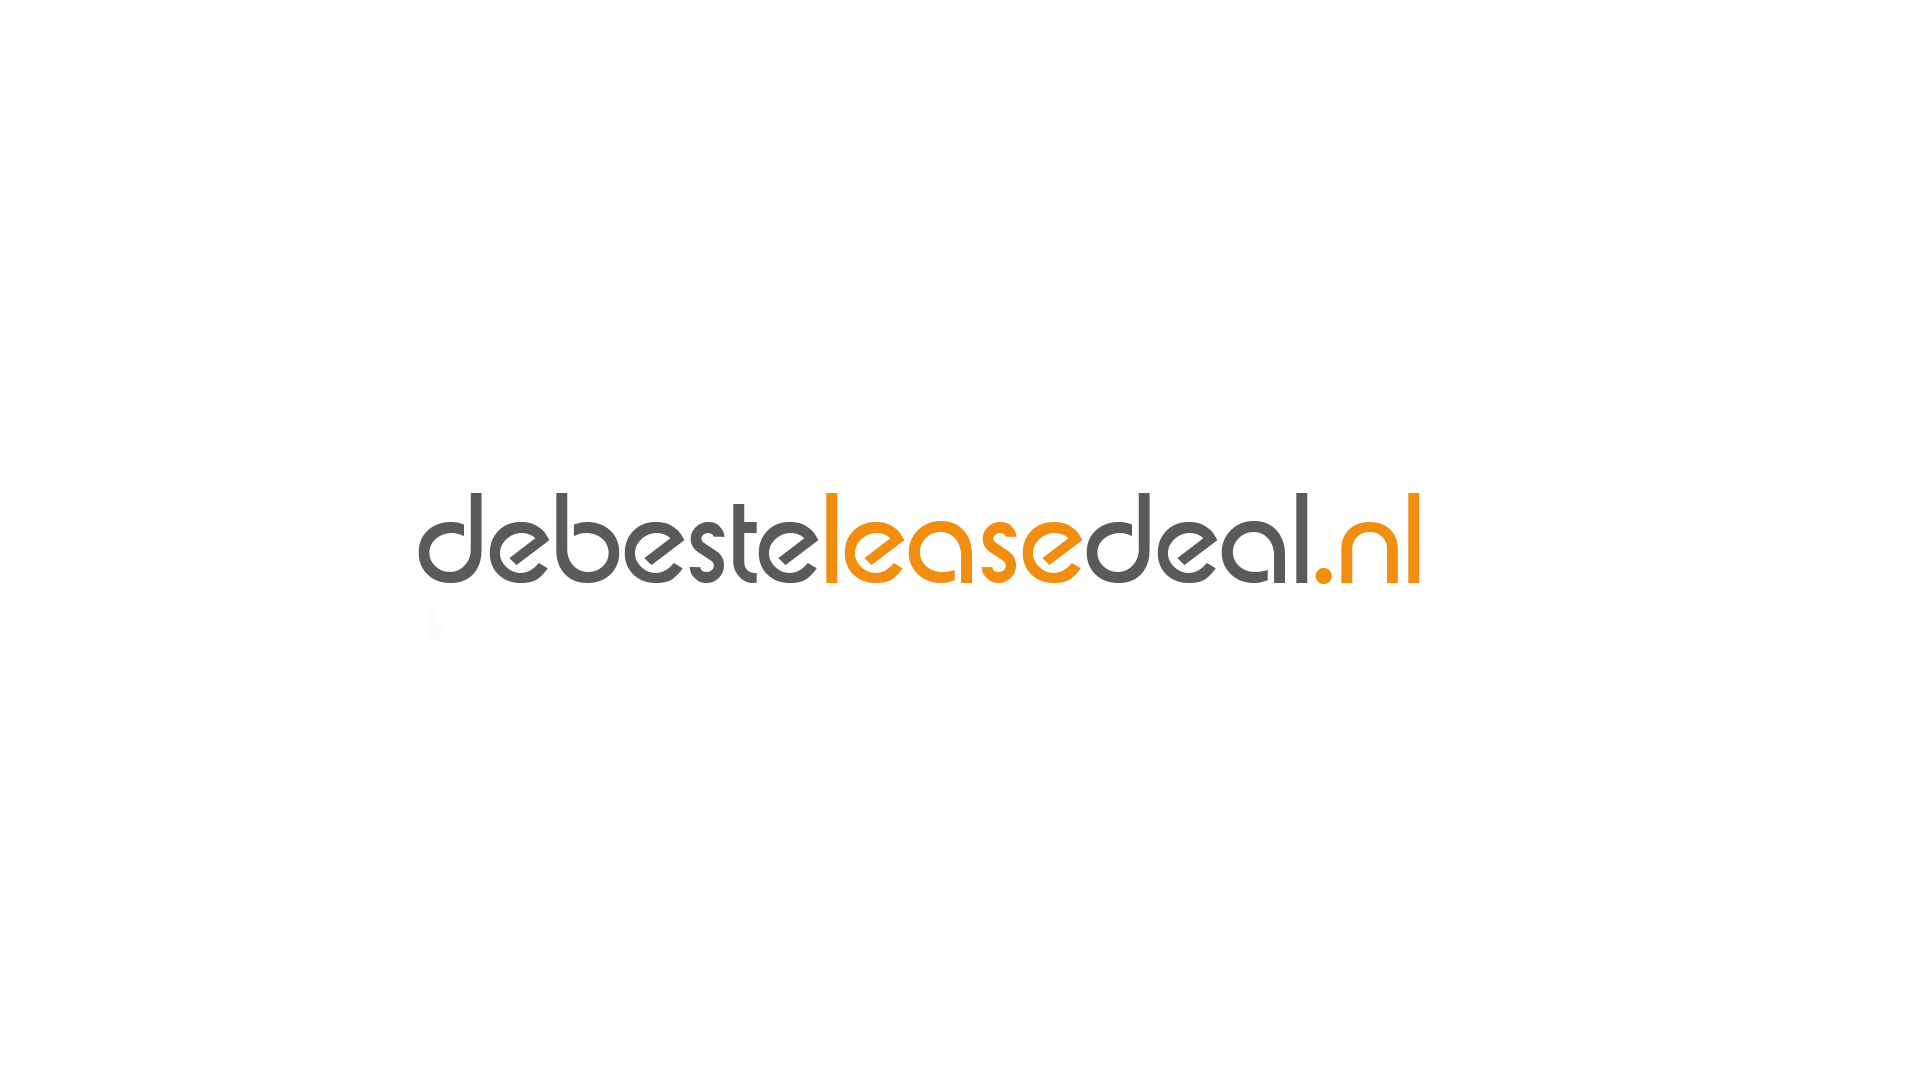 De beste lease deal